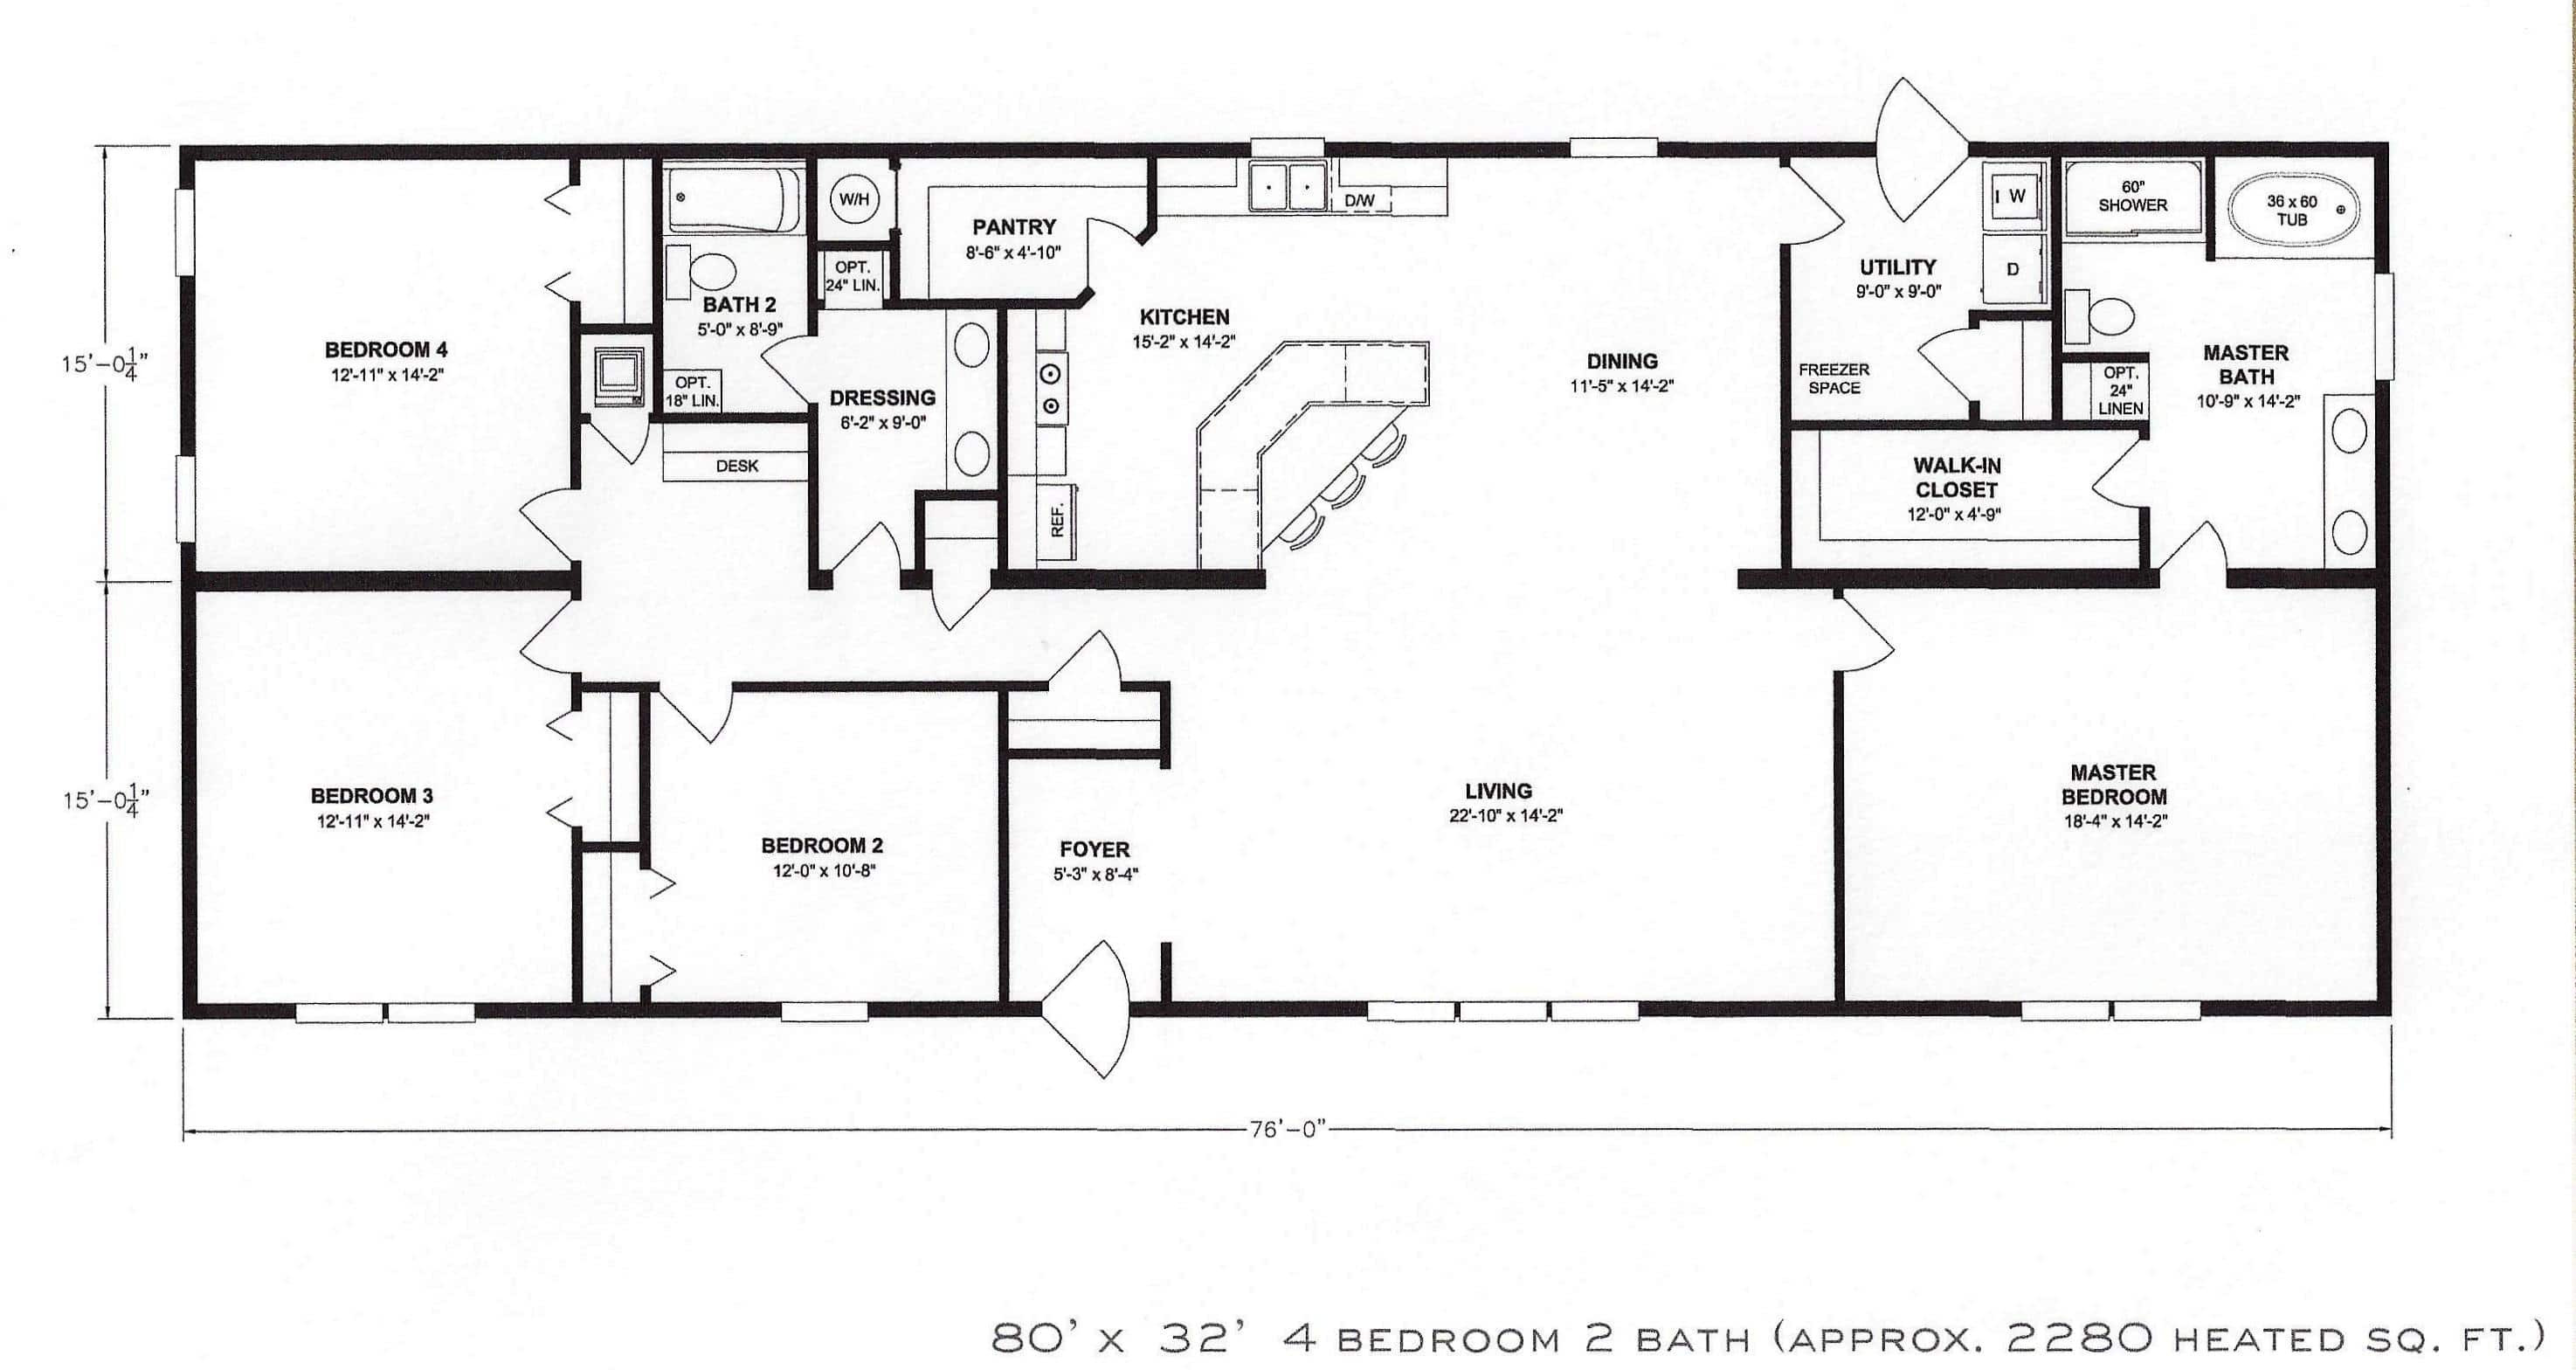 Best ideas about 4 Bedroom Floor Plans . Save or Pin 4 Bedroom Floor Plan F 1001 Hawks Homes Now.